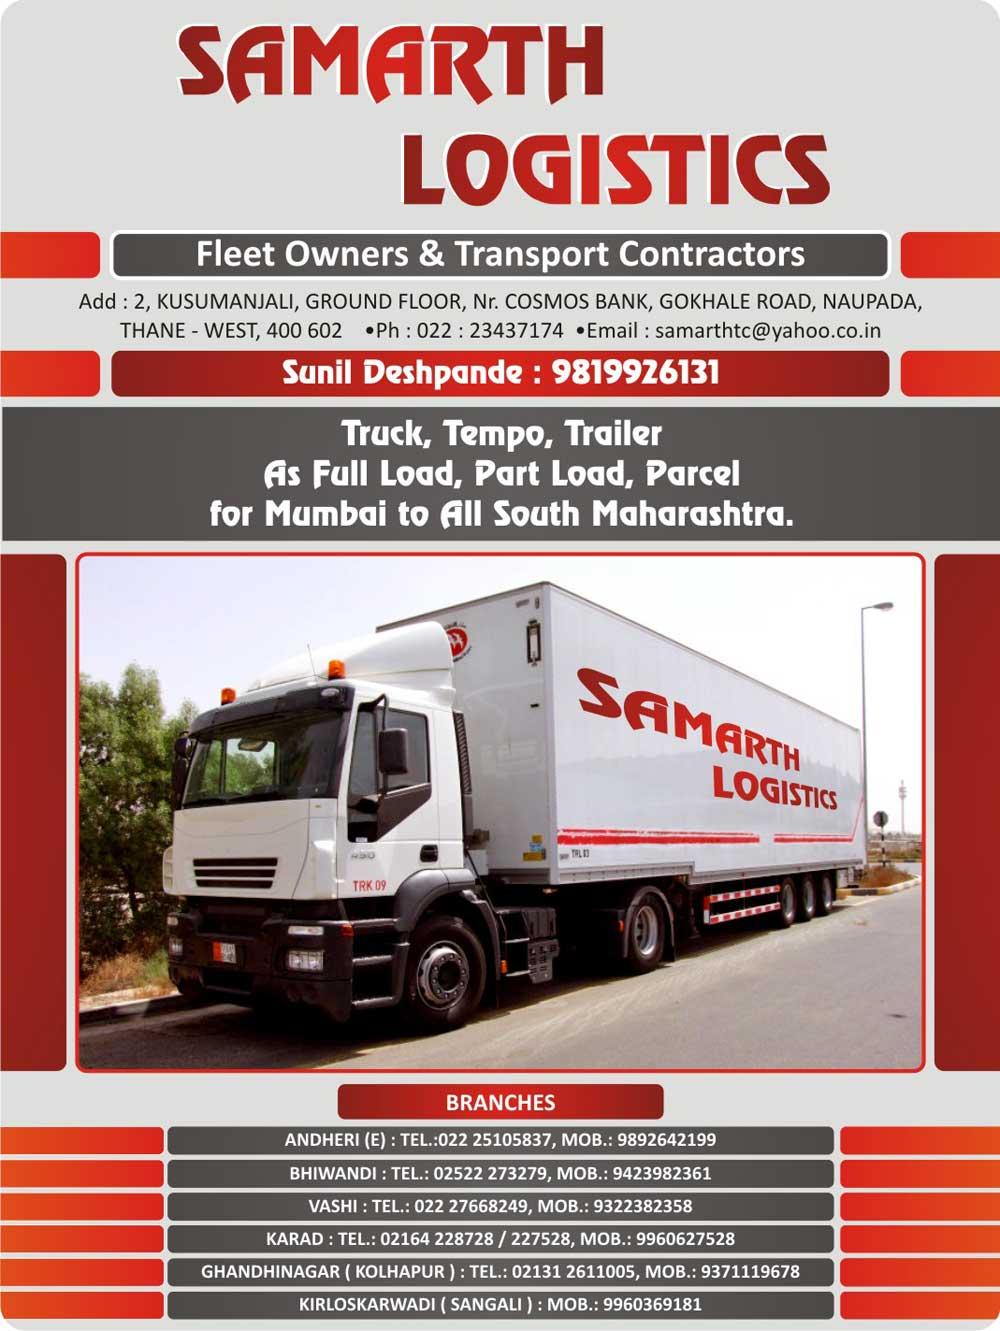 Samarth Logistics